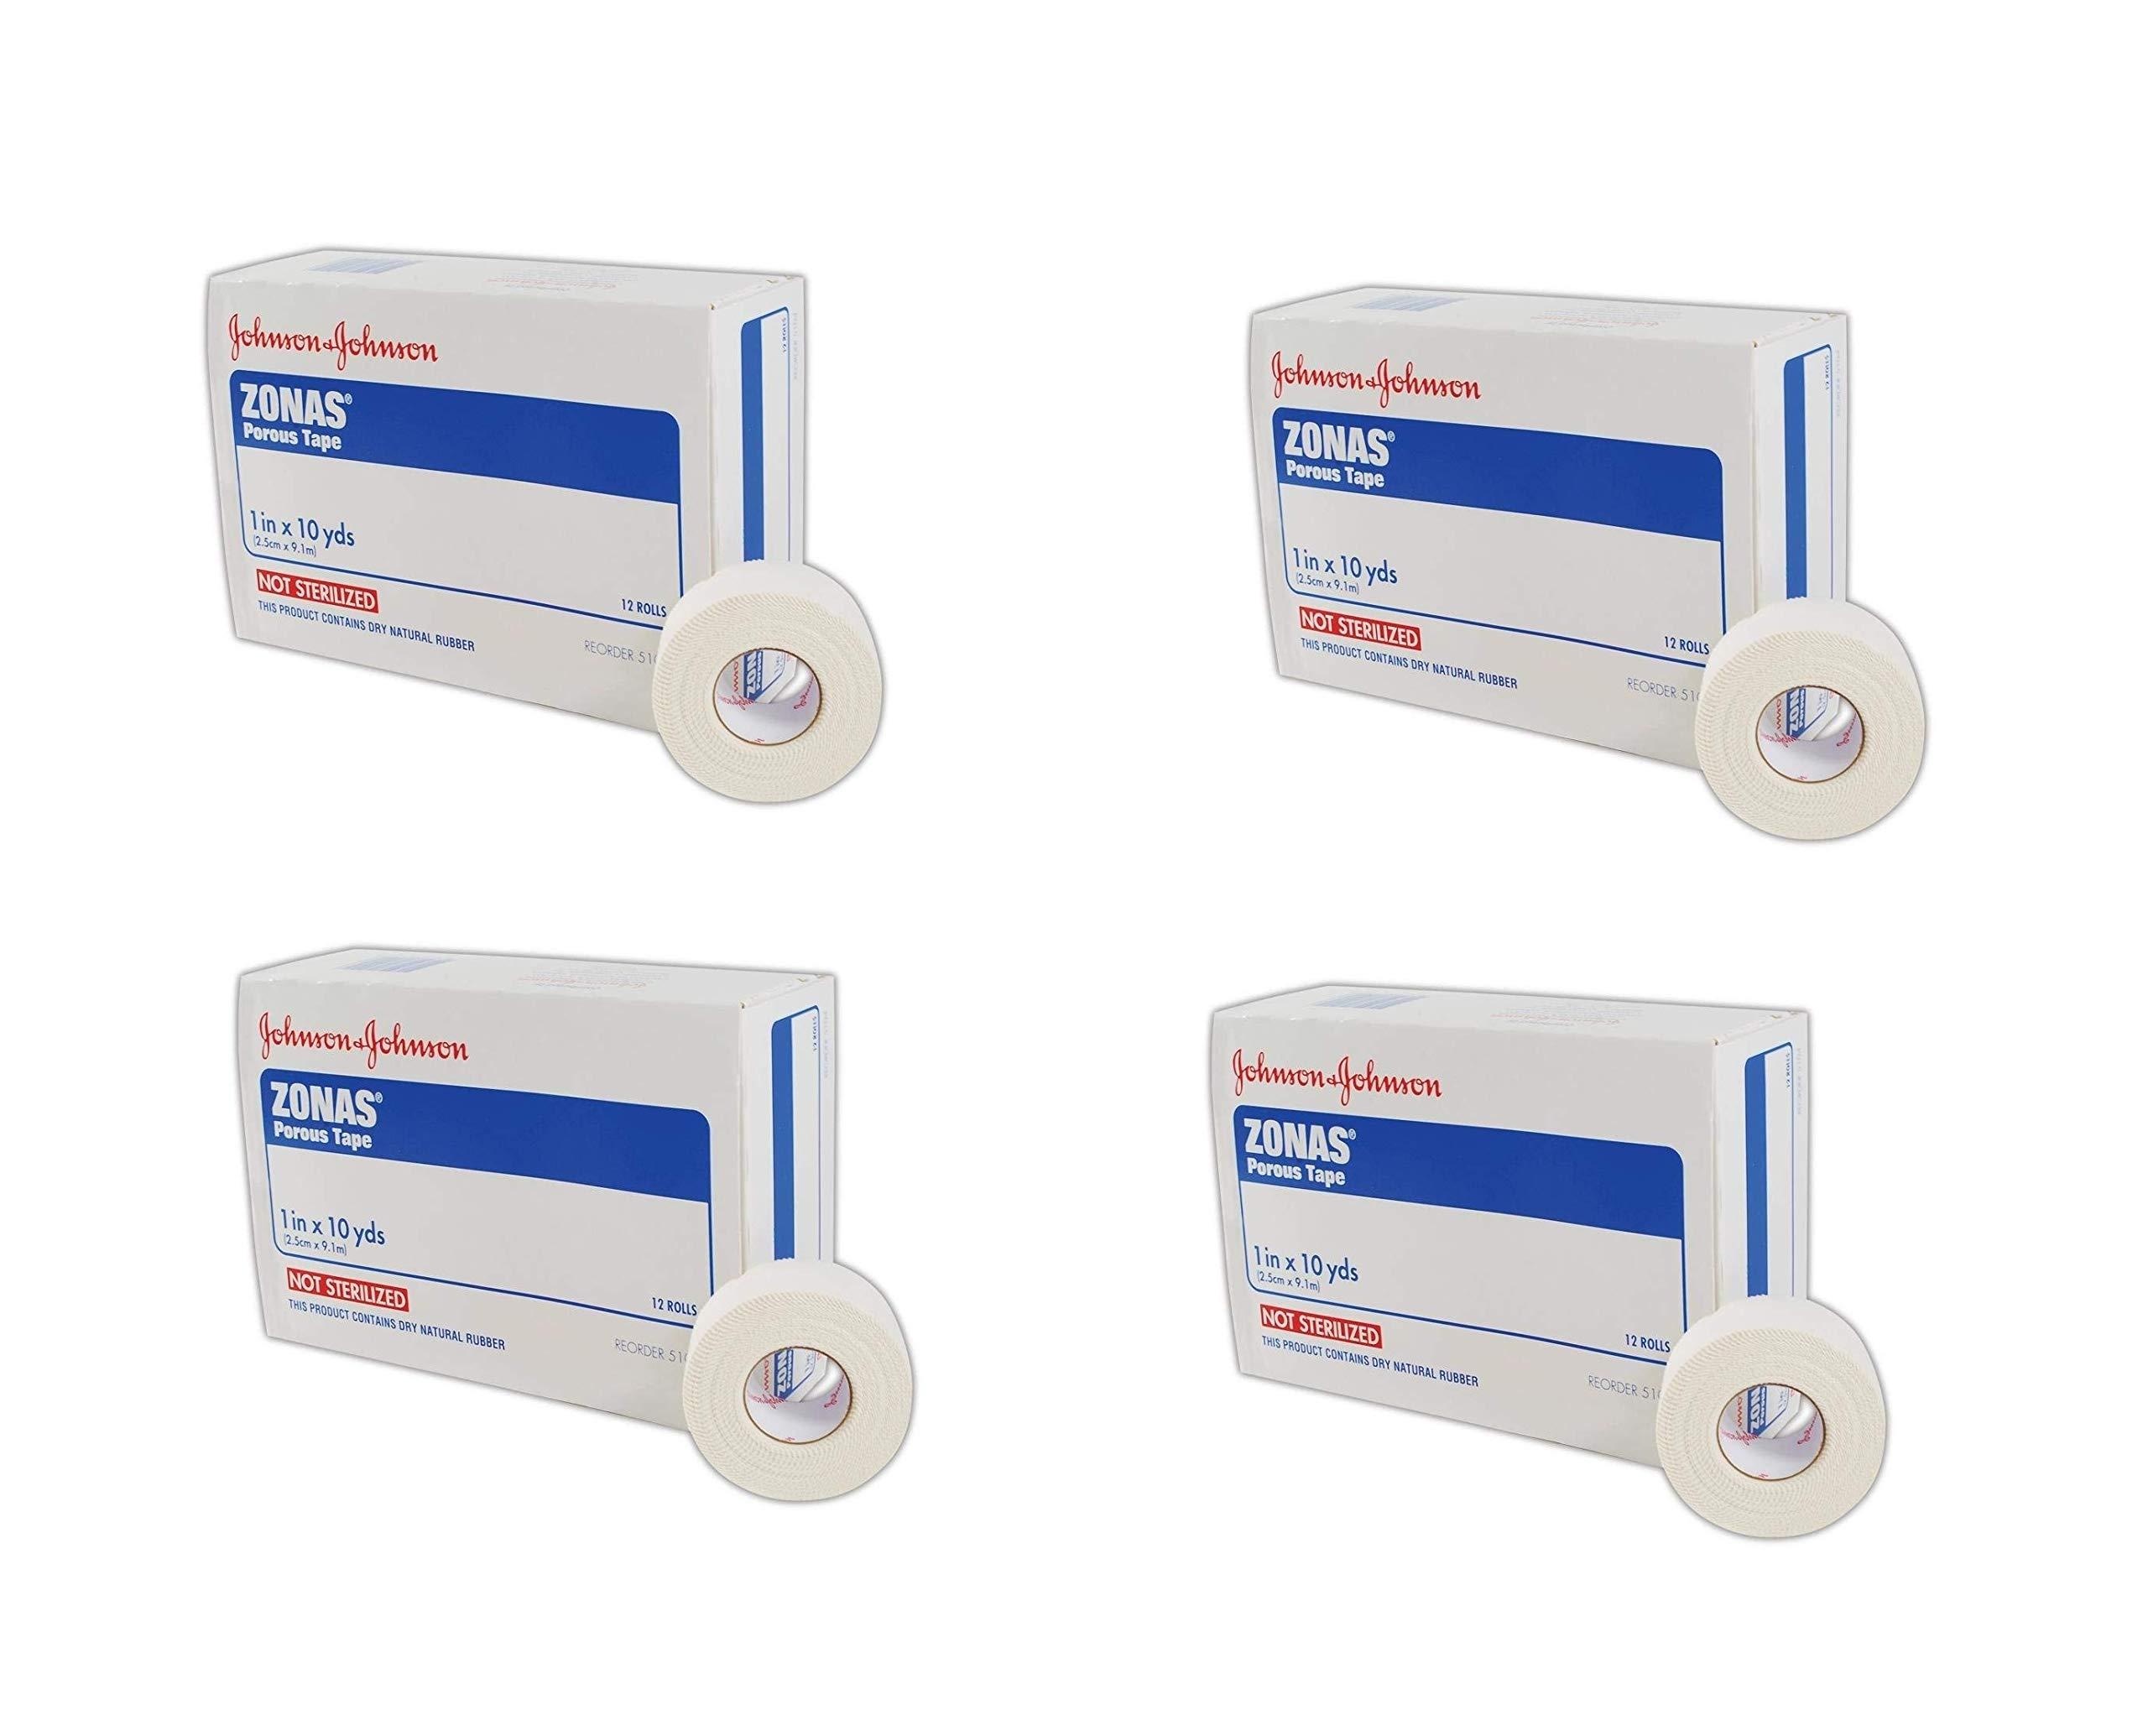 Johnson & Johnson JJ5104 Zonas Porous Adhesive Tape, 1'' x 10'', White, 12 Count (4 Pack)